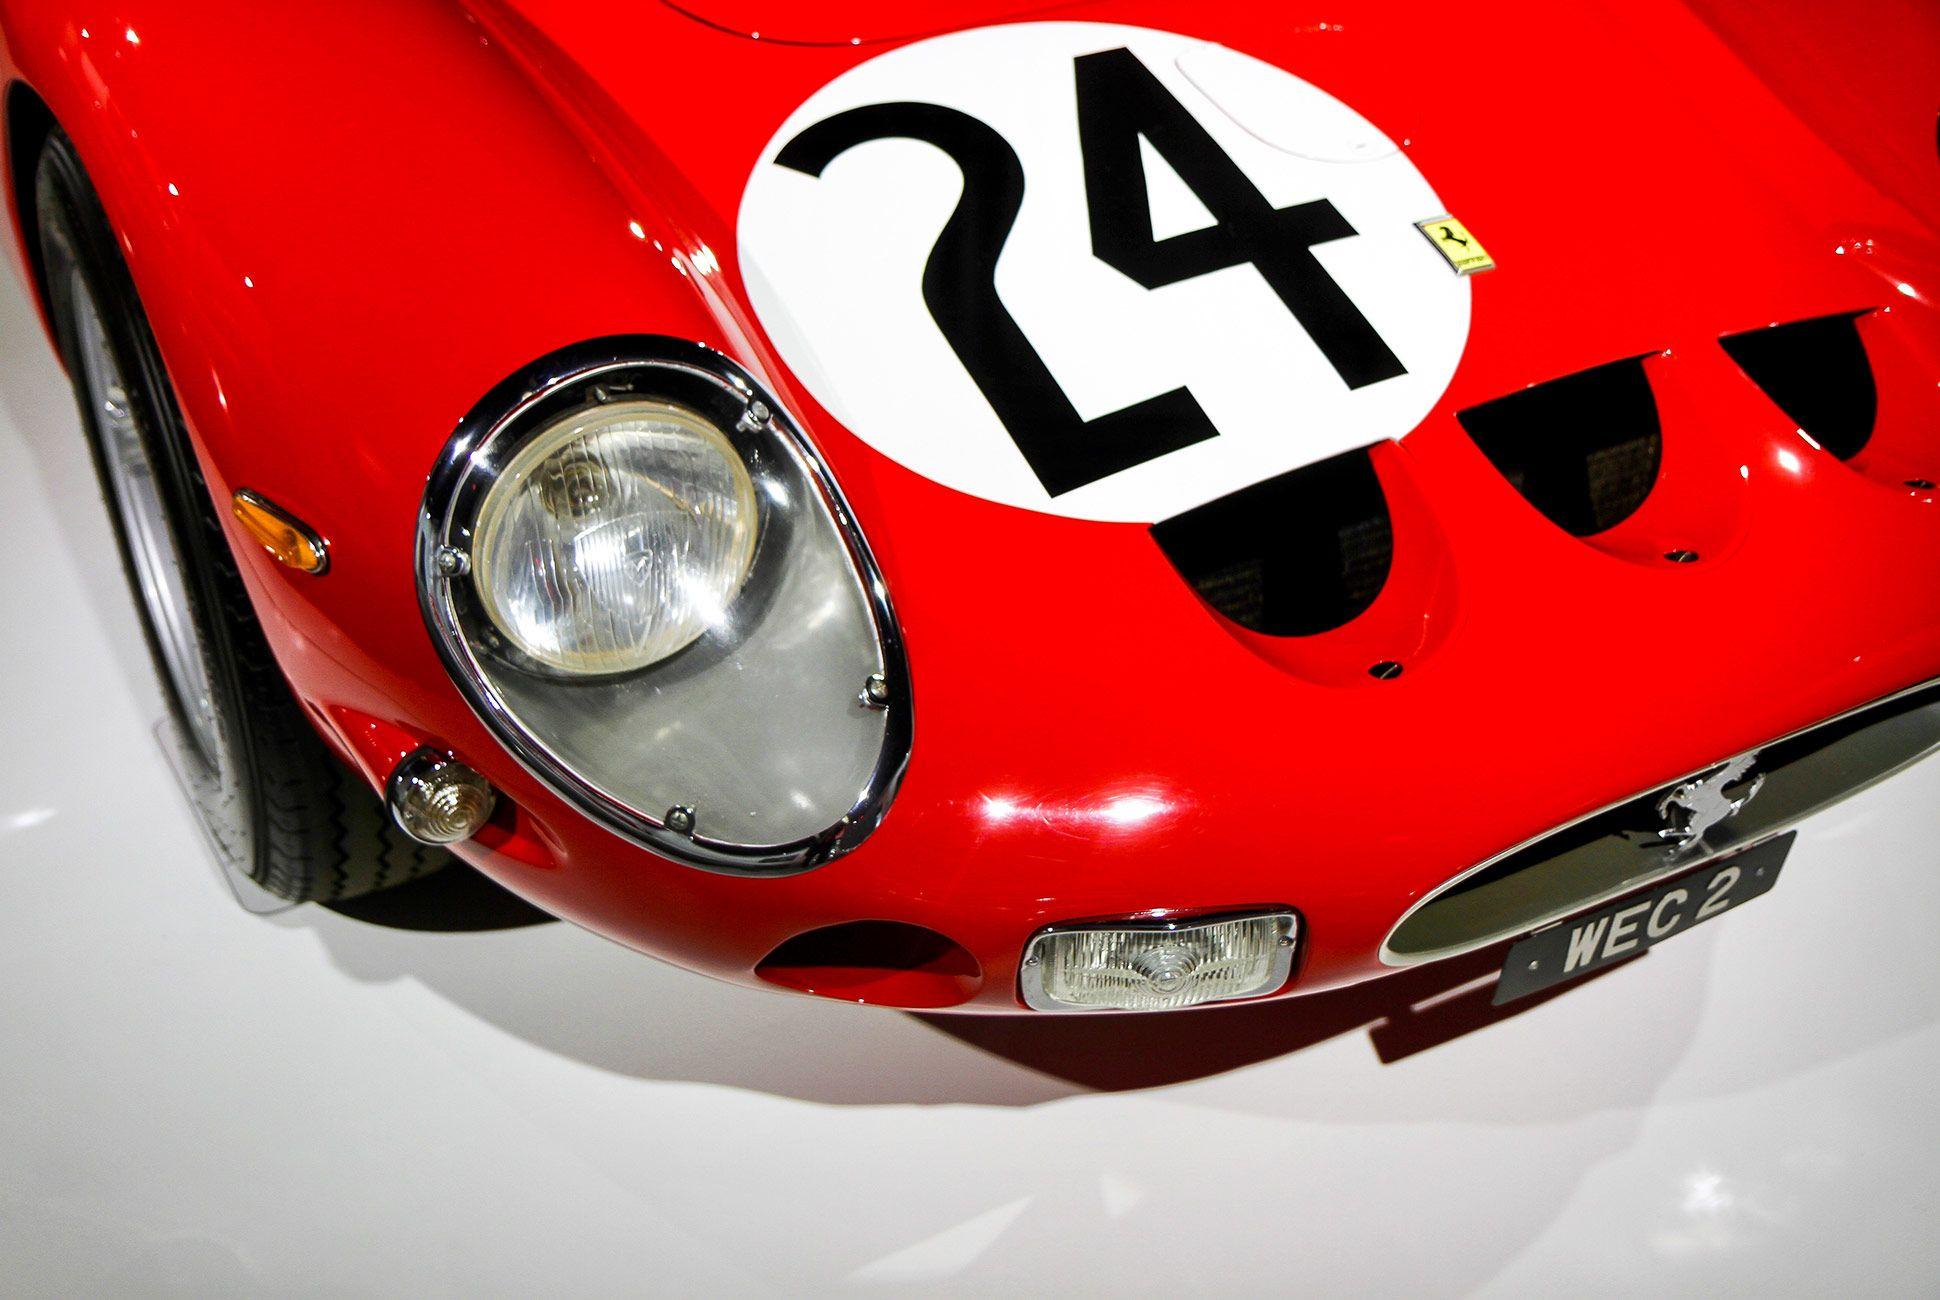 Ferrari-gear-patrol-12